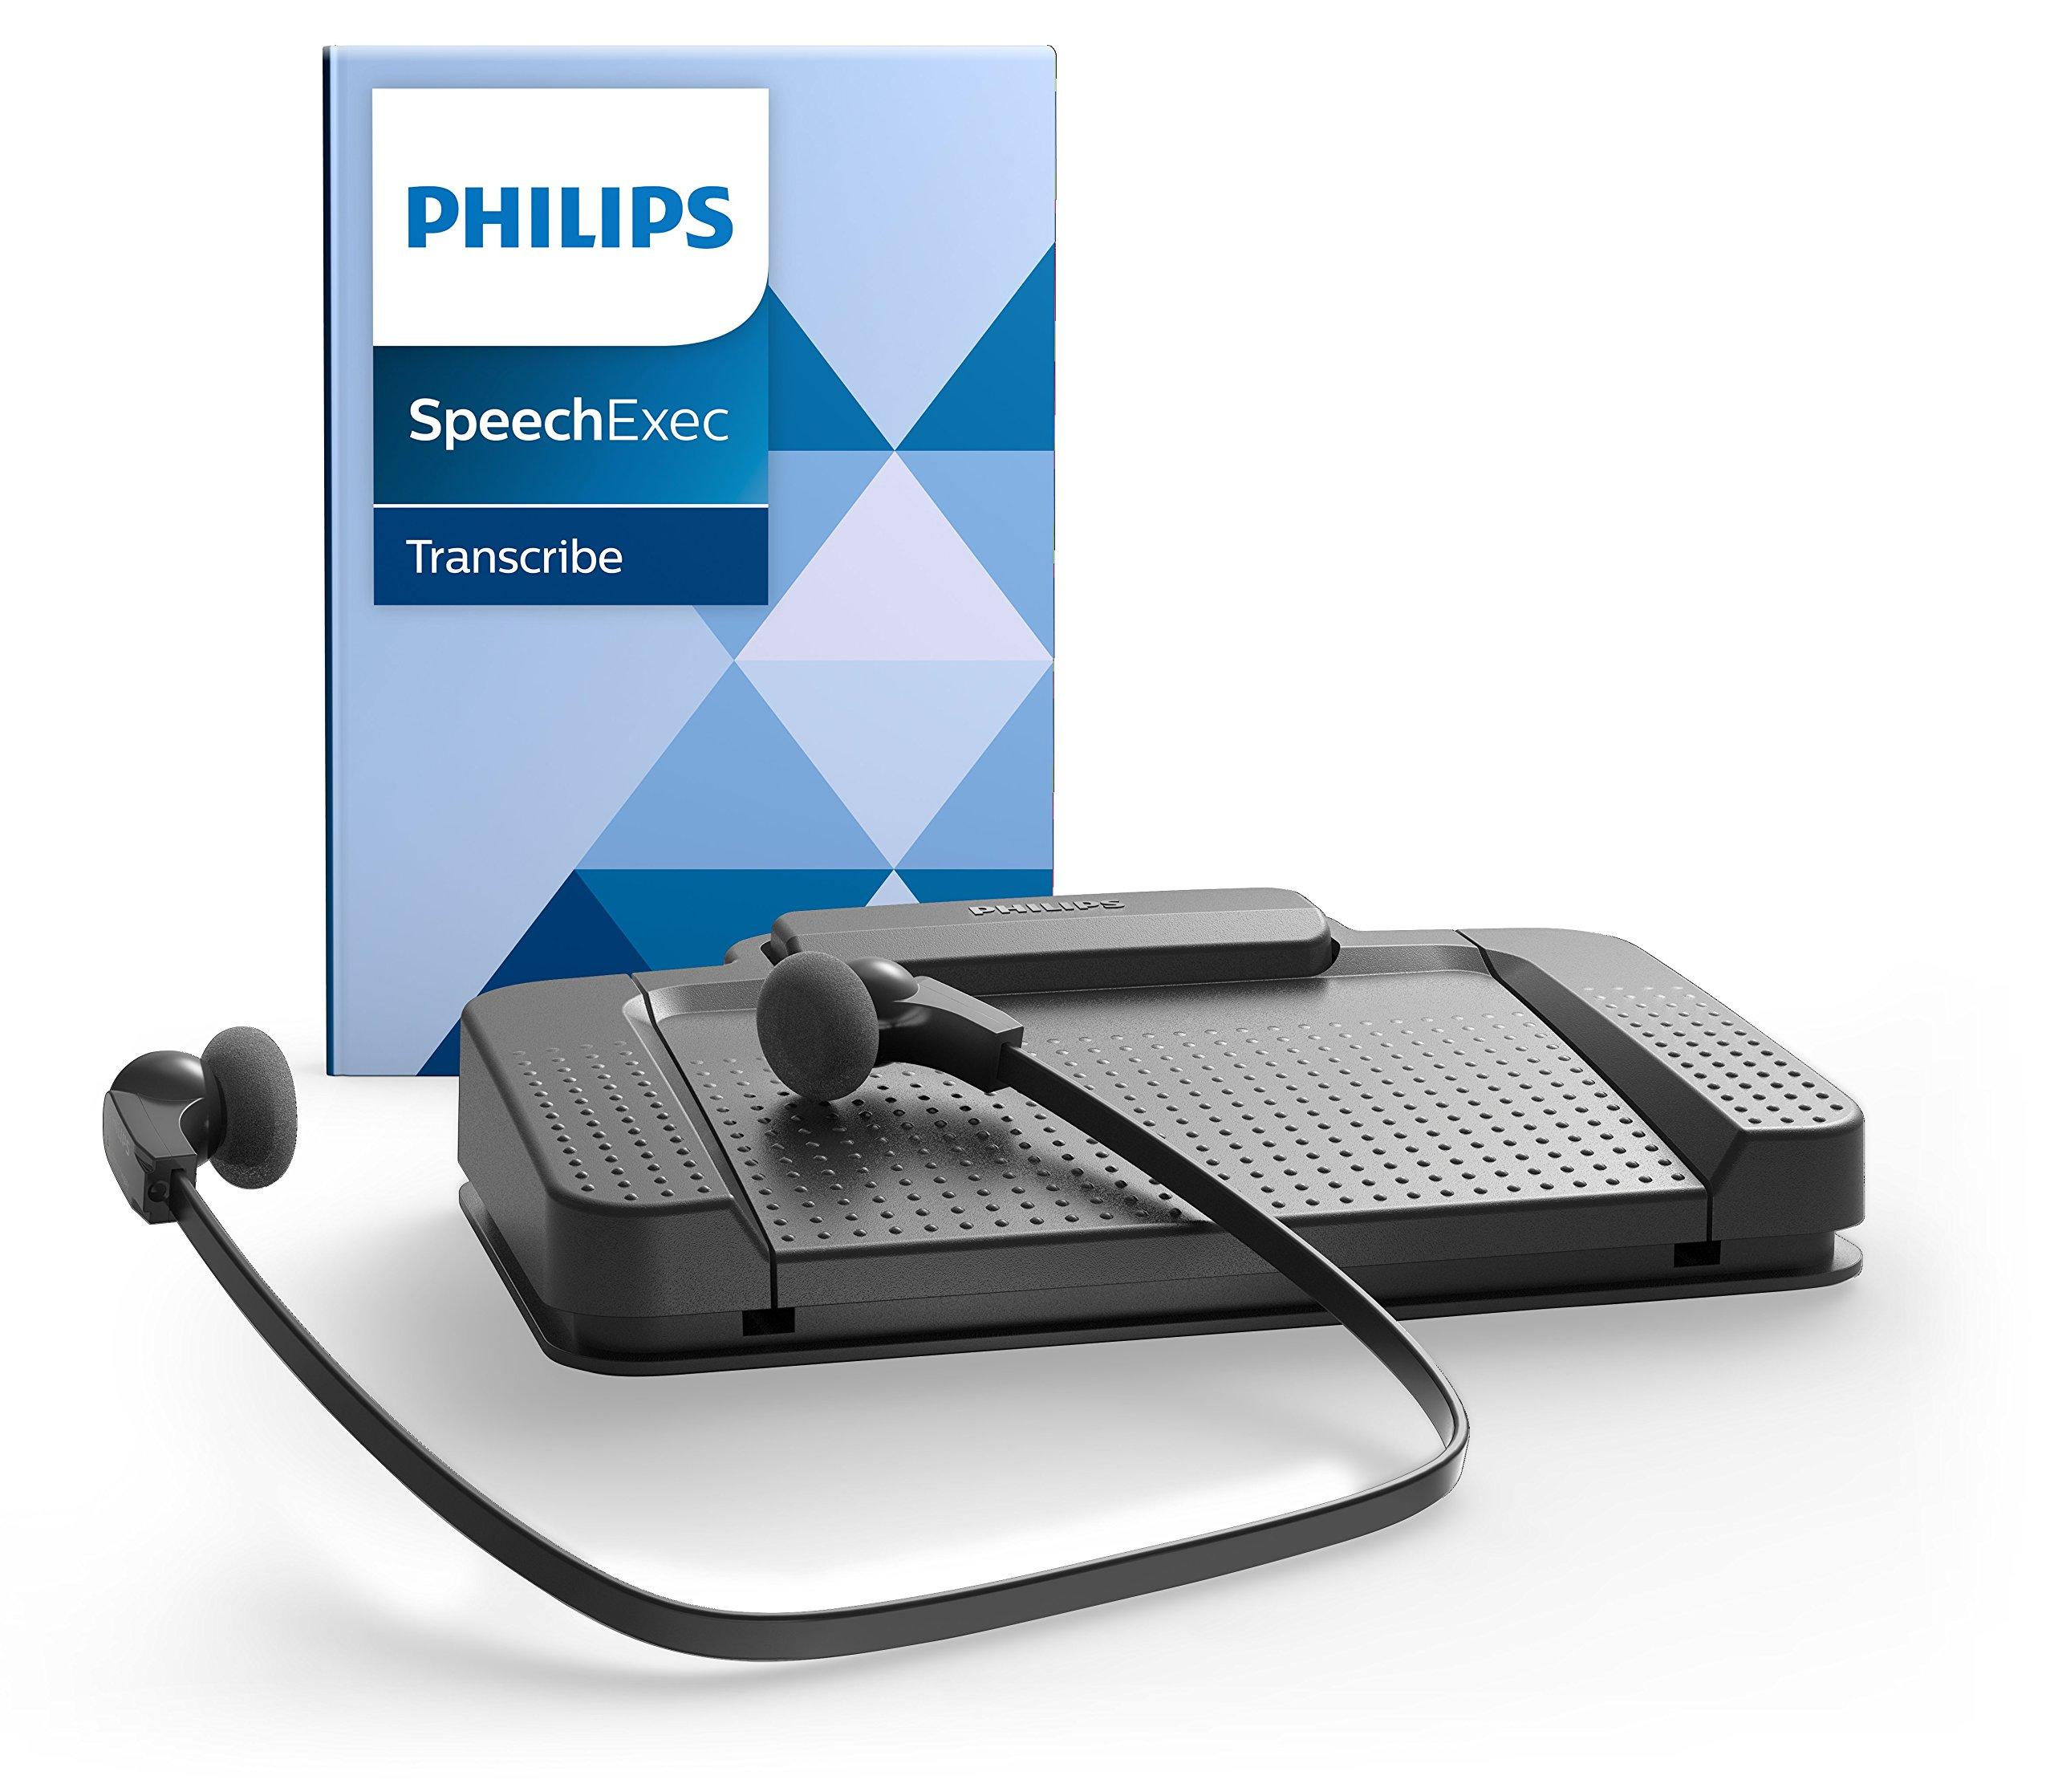 Philips USB SpeechExec Transcription Set 7177 by Philips Speech